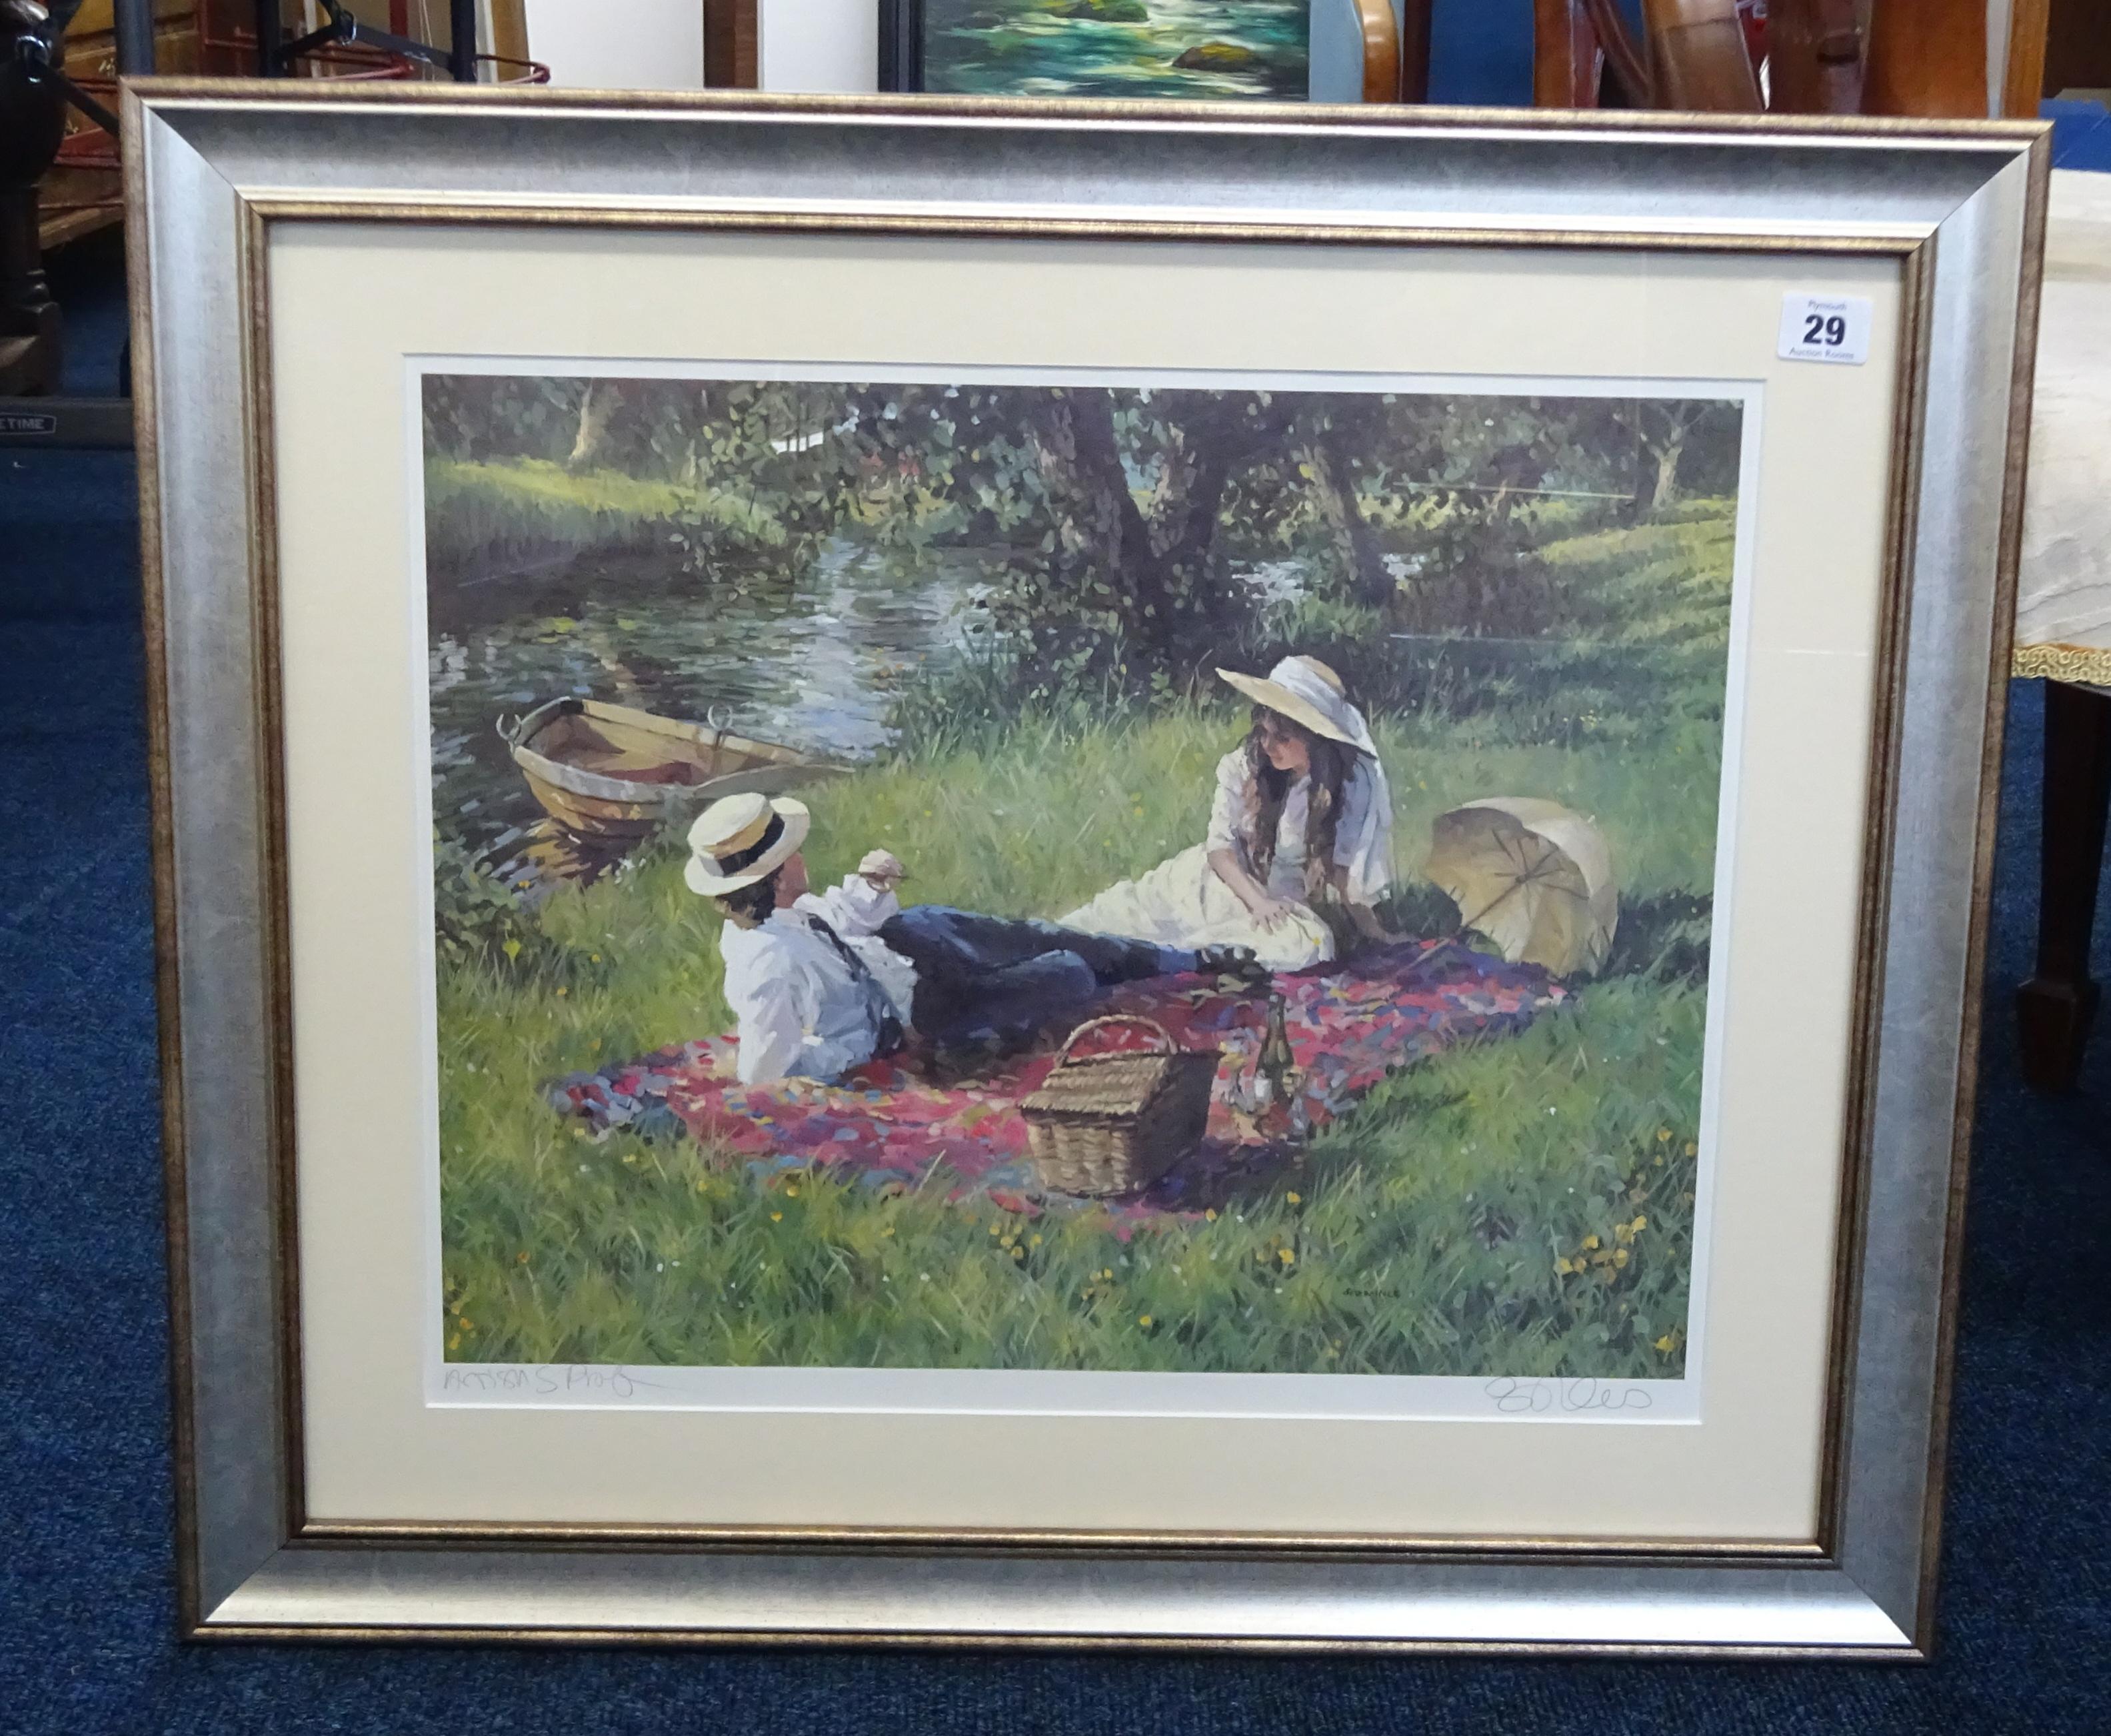 Lot 029 - Sherree Valentine Daines, signed Artist Proof print 'Summer Lake' framed, 38cm x 55cm.